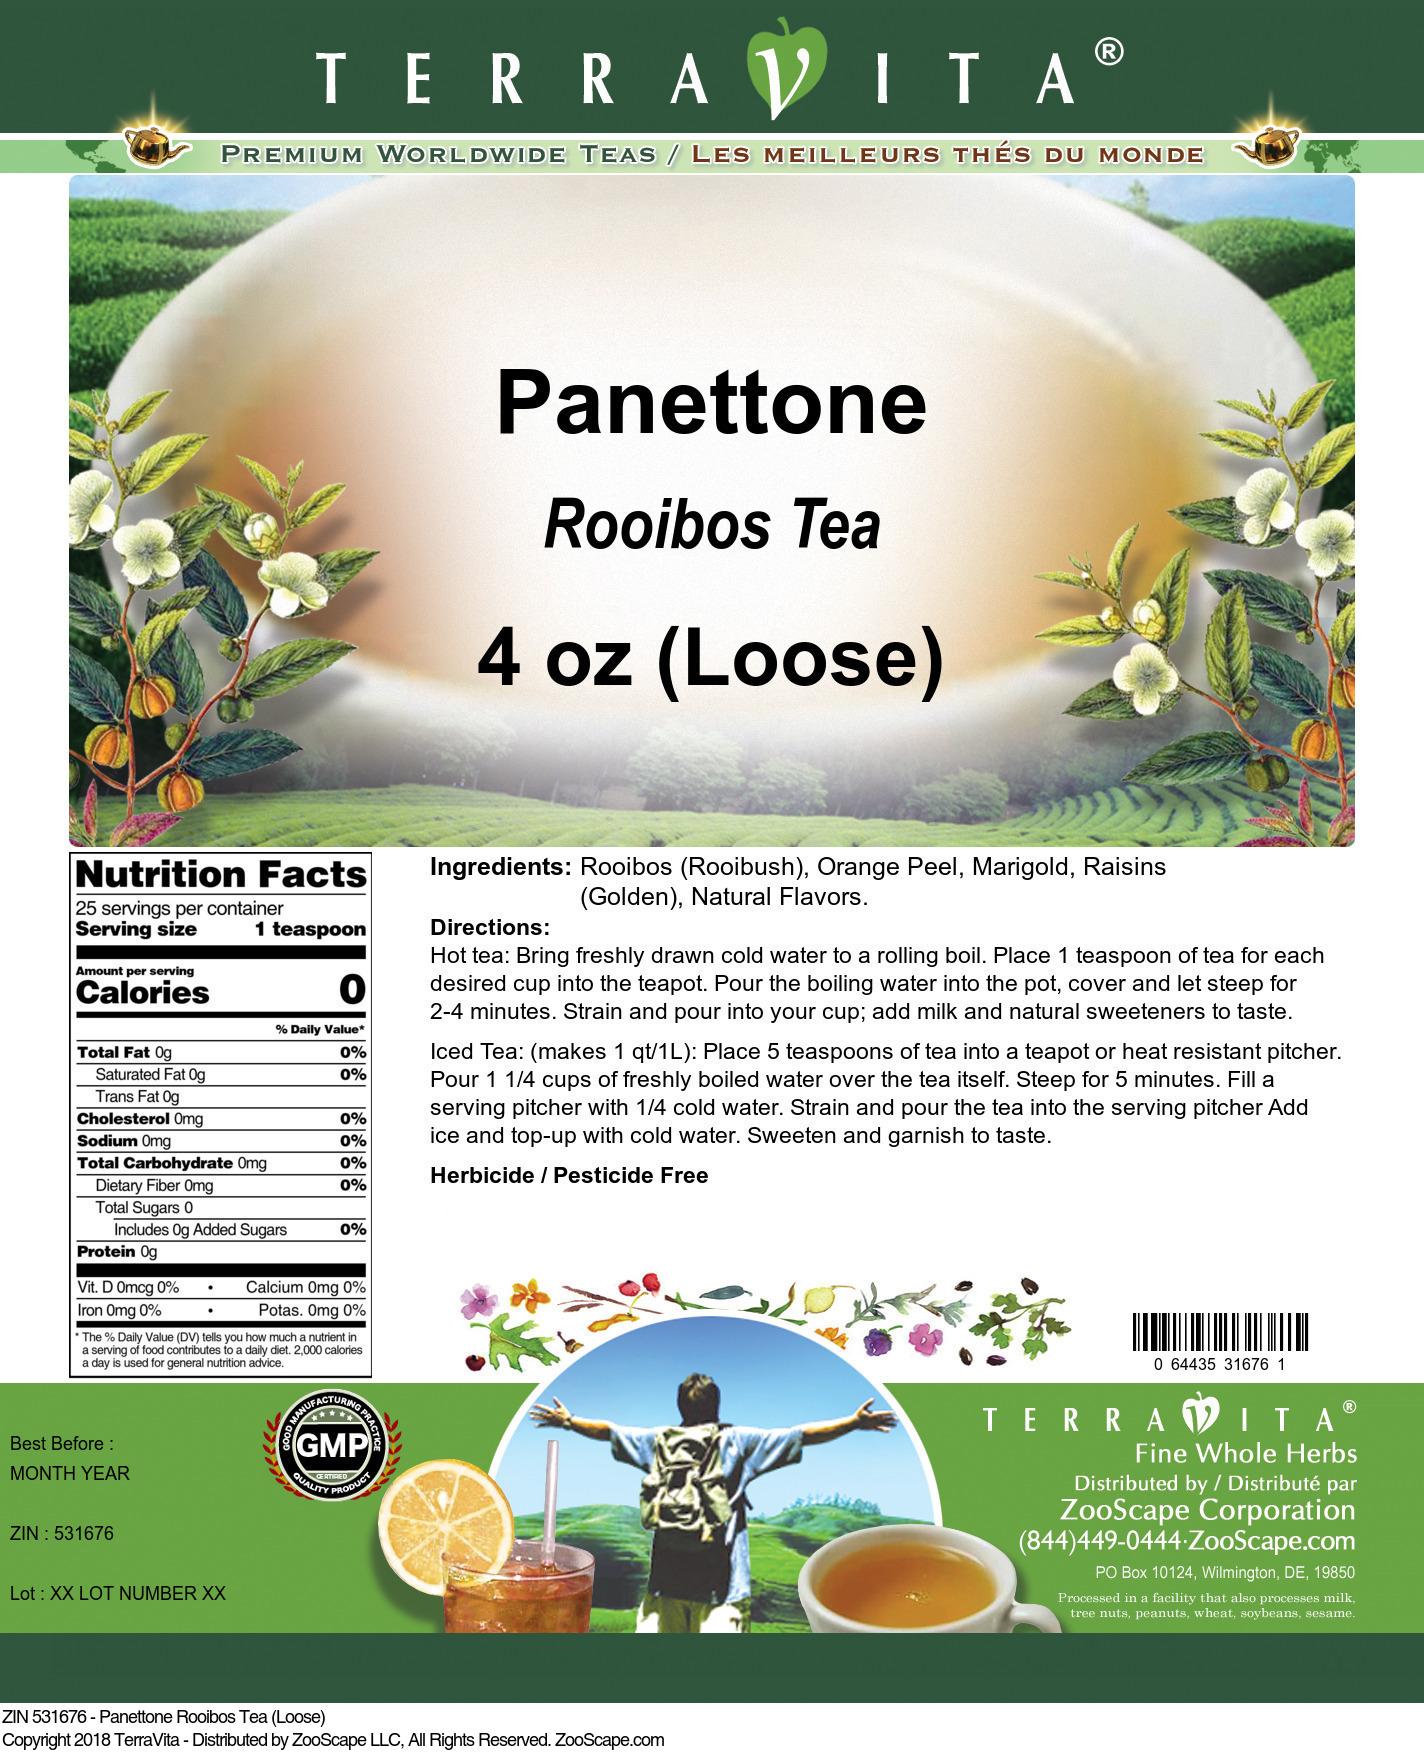 Panettone Rooibos Tea (Loose)